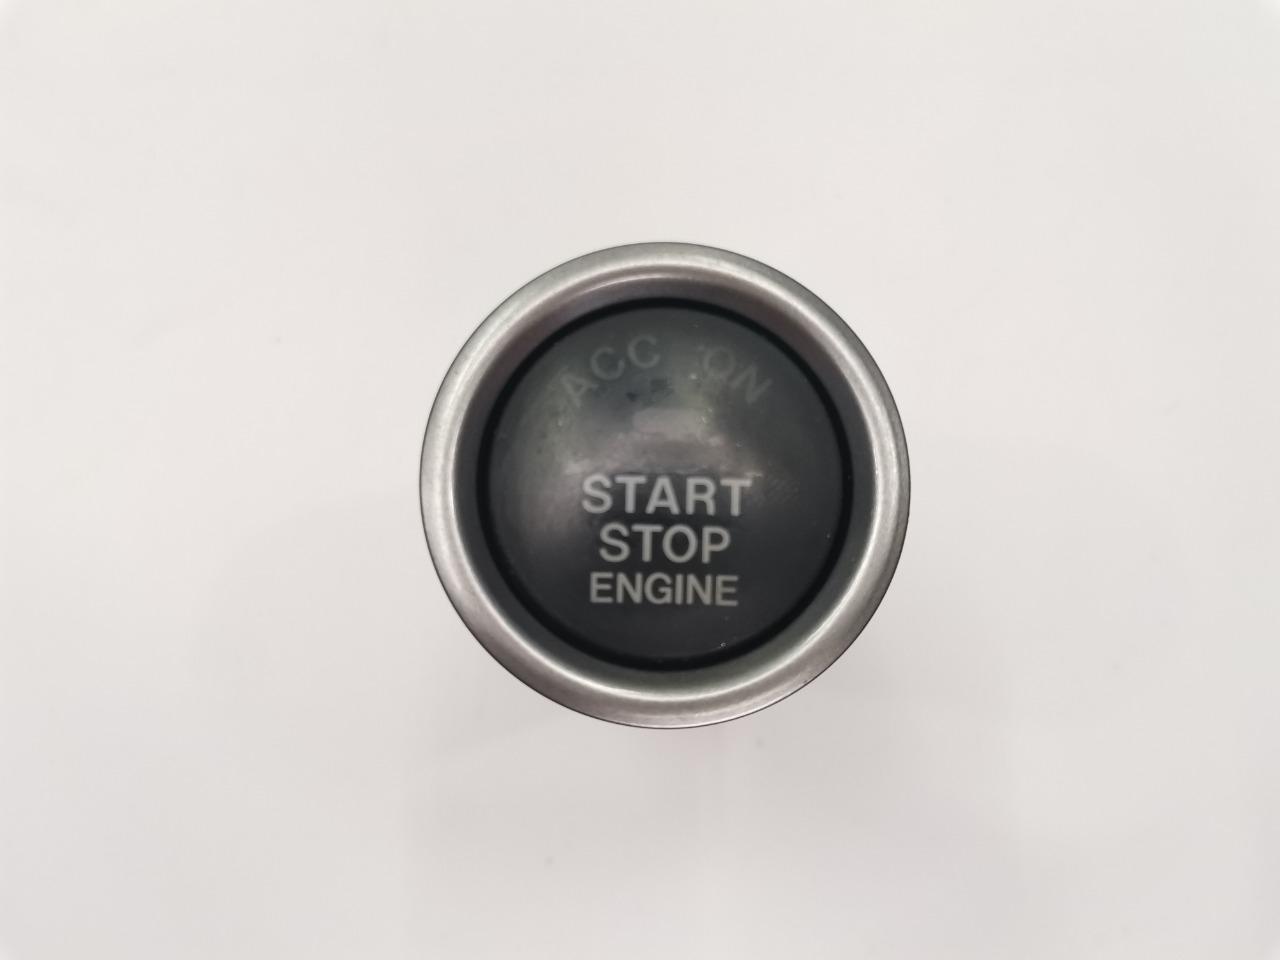 Кнопка start / stop engine Mazda Mazda6 GH 2008